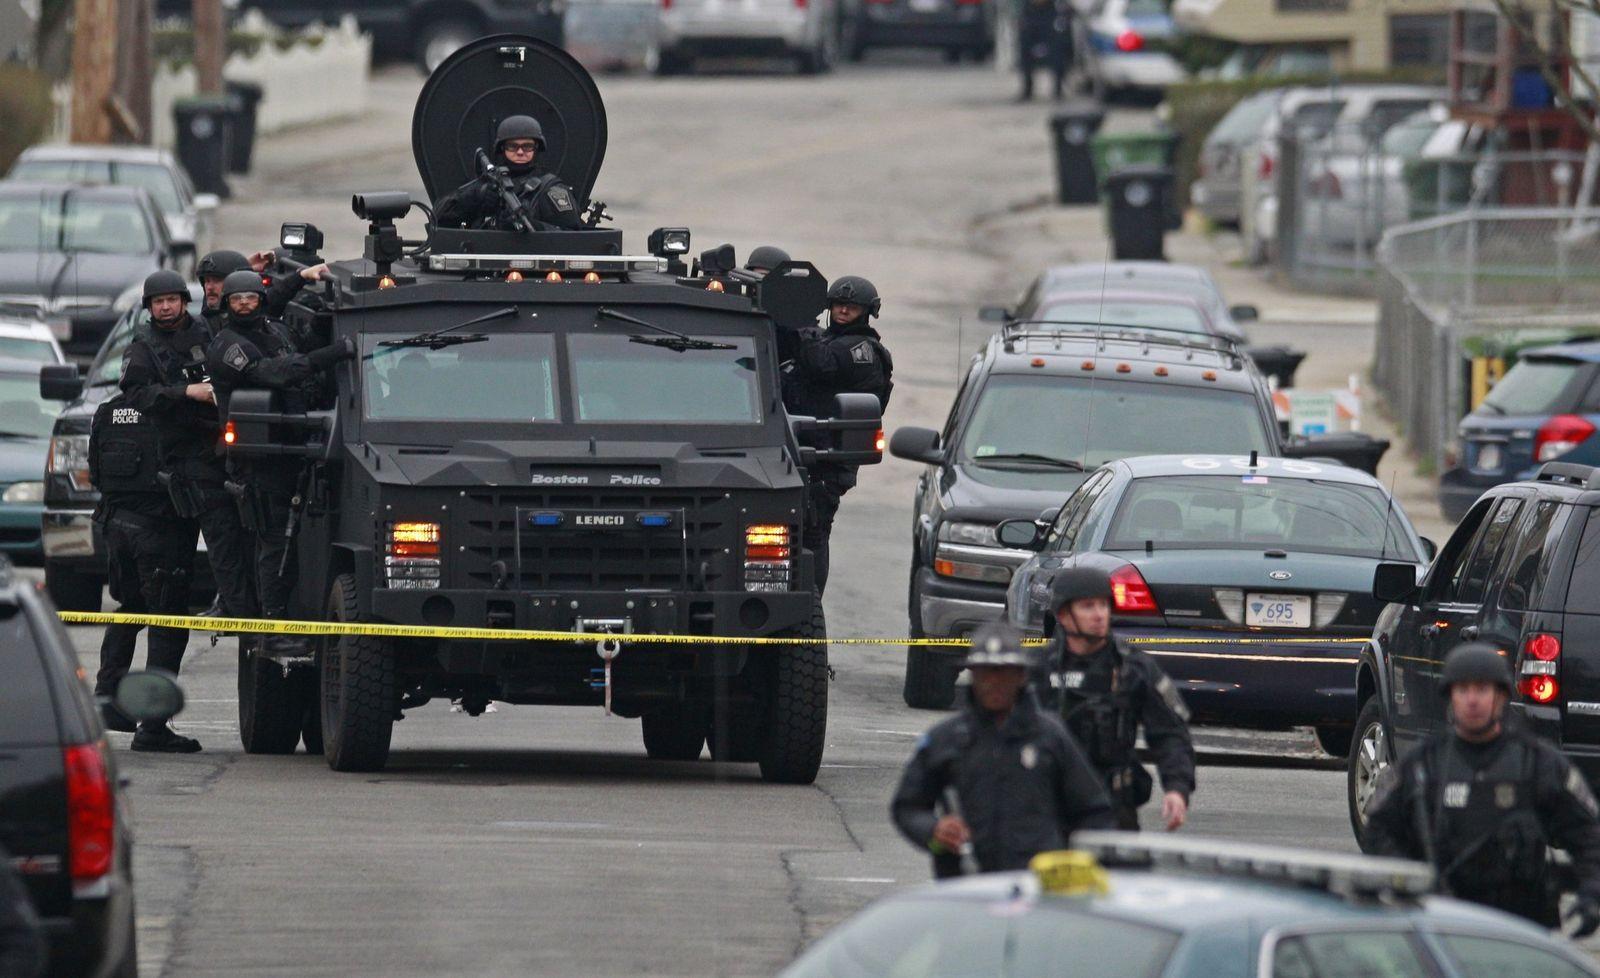 Cambridge/ Watertown/ Boston-Anschlag